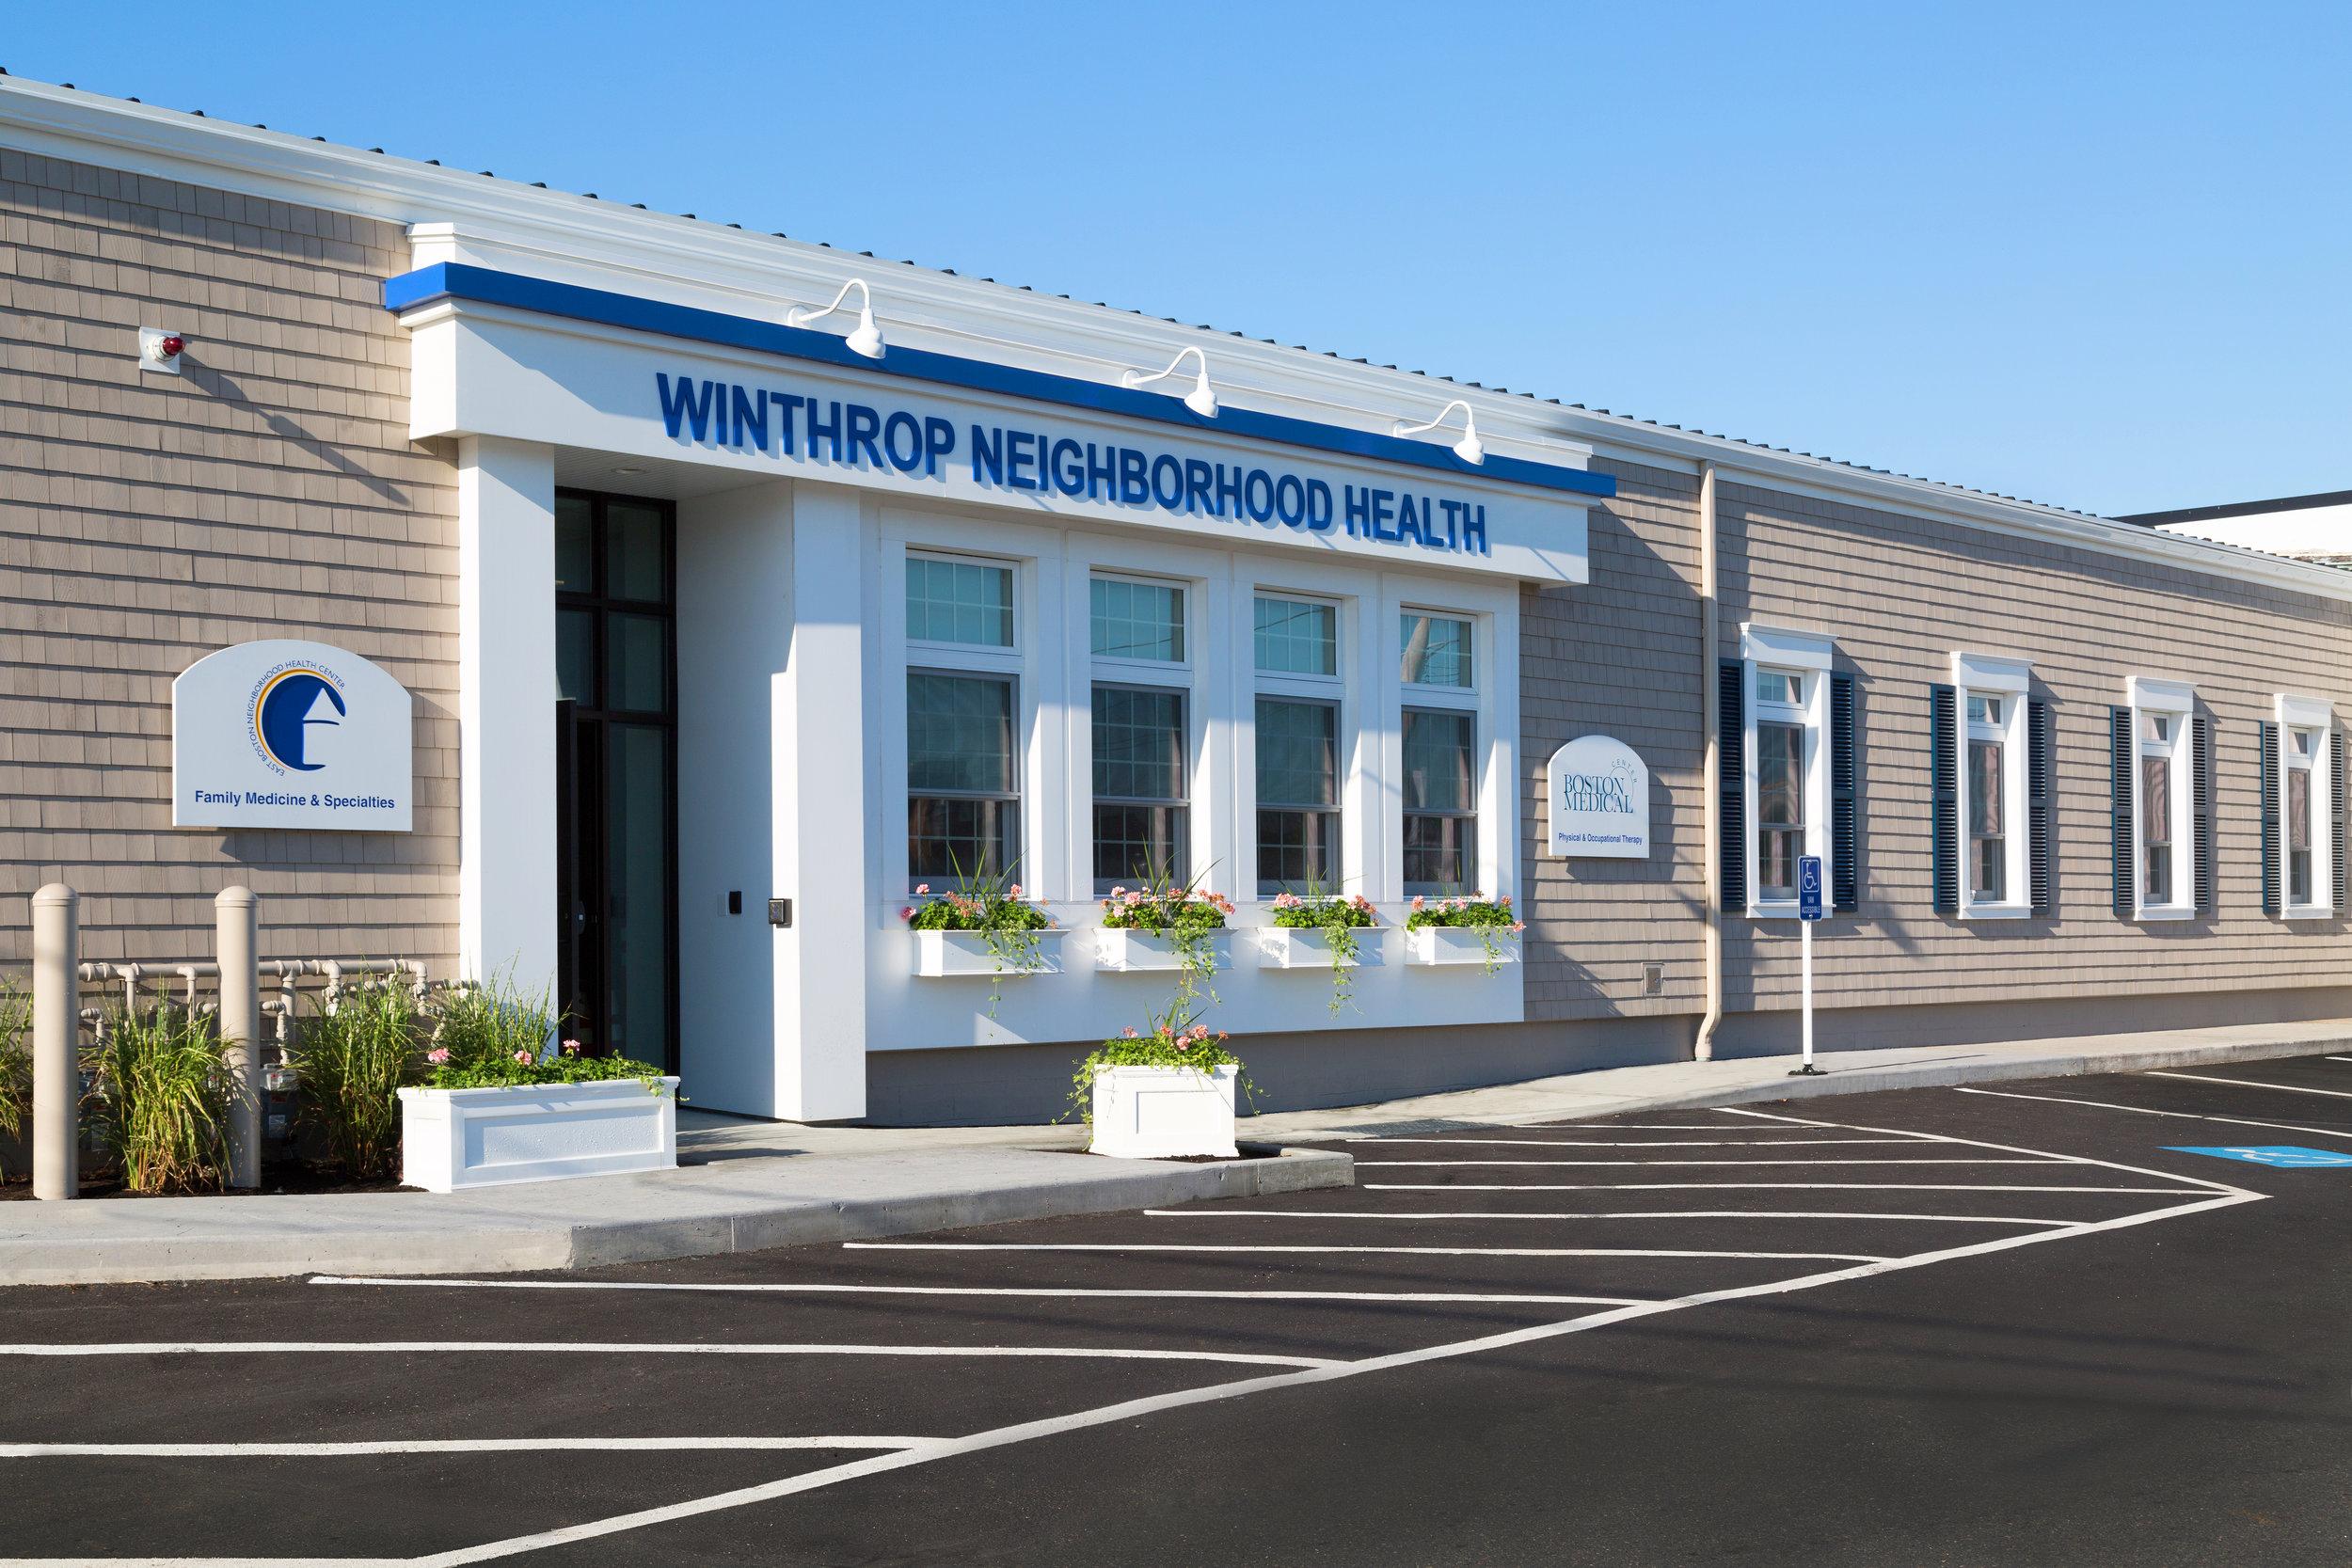 Winthrop Neighborhood Health     East Boston Neighborhood Health Center